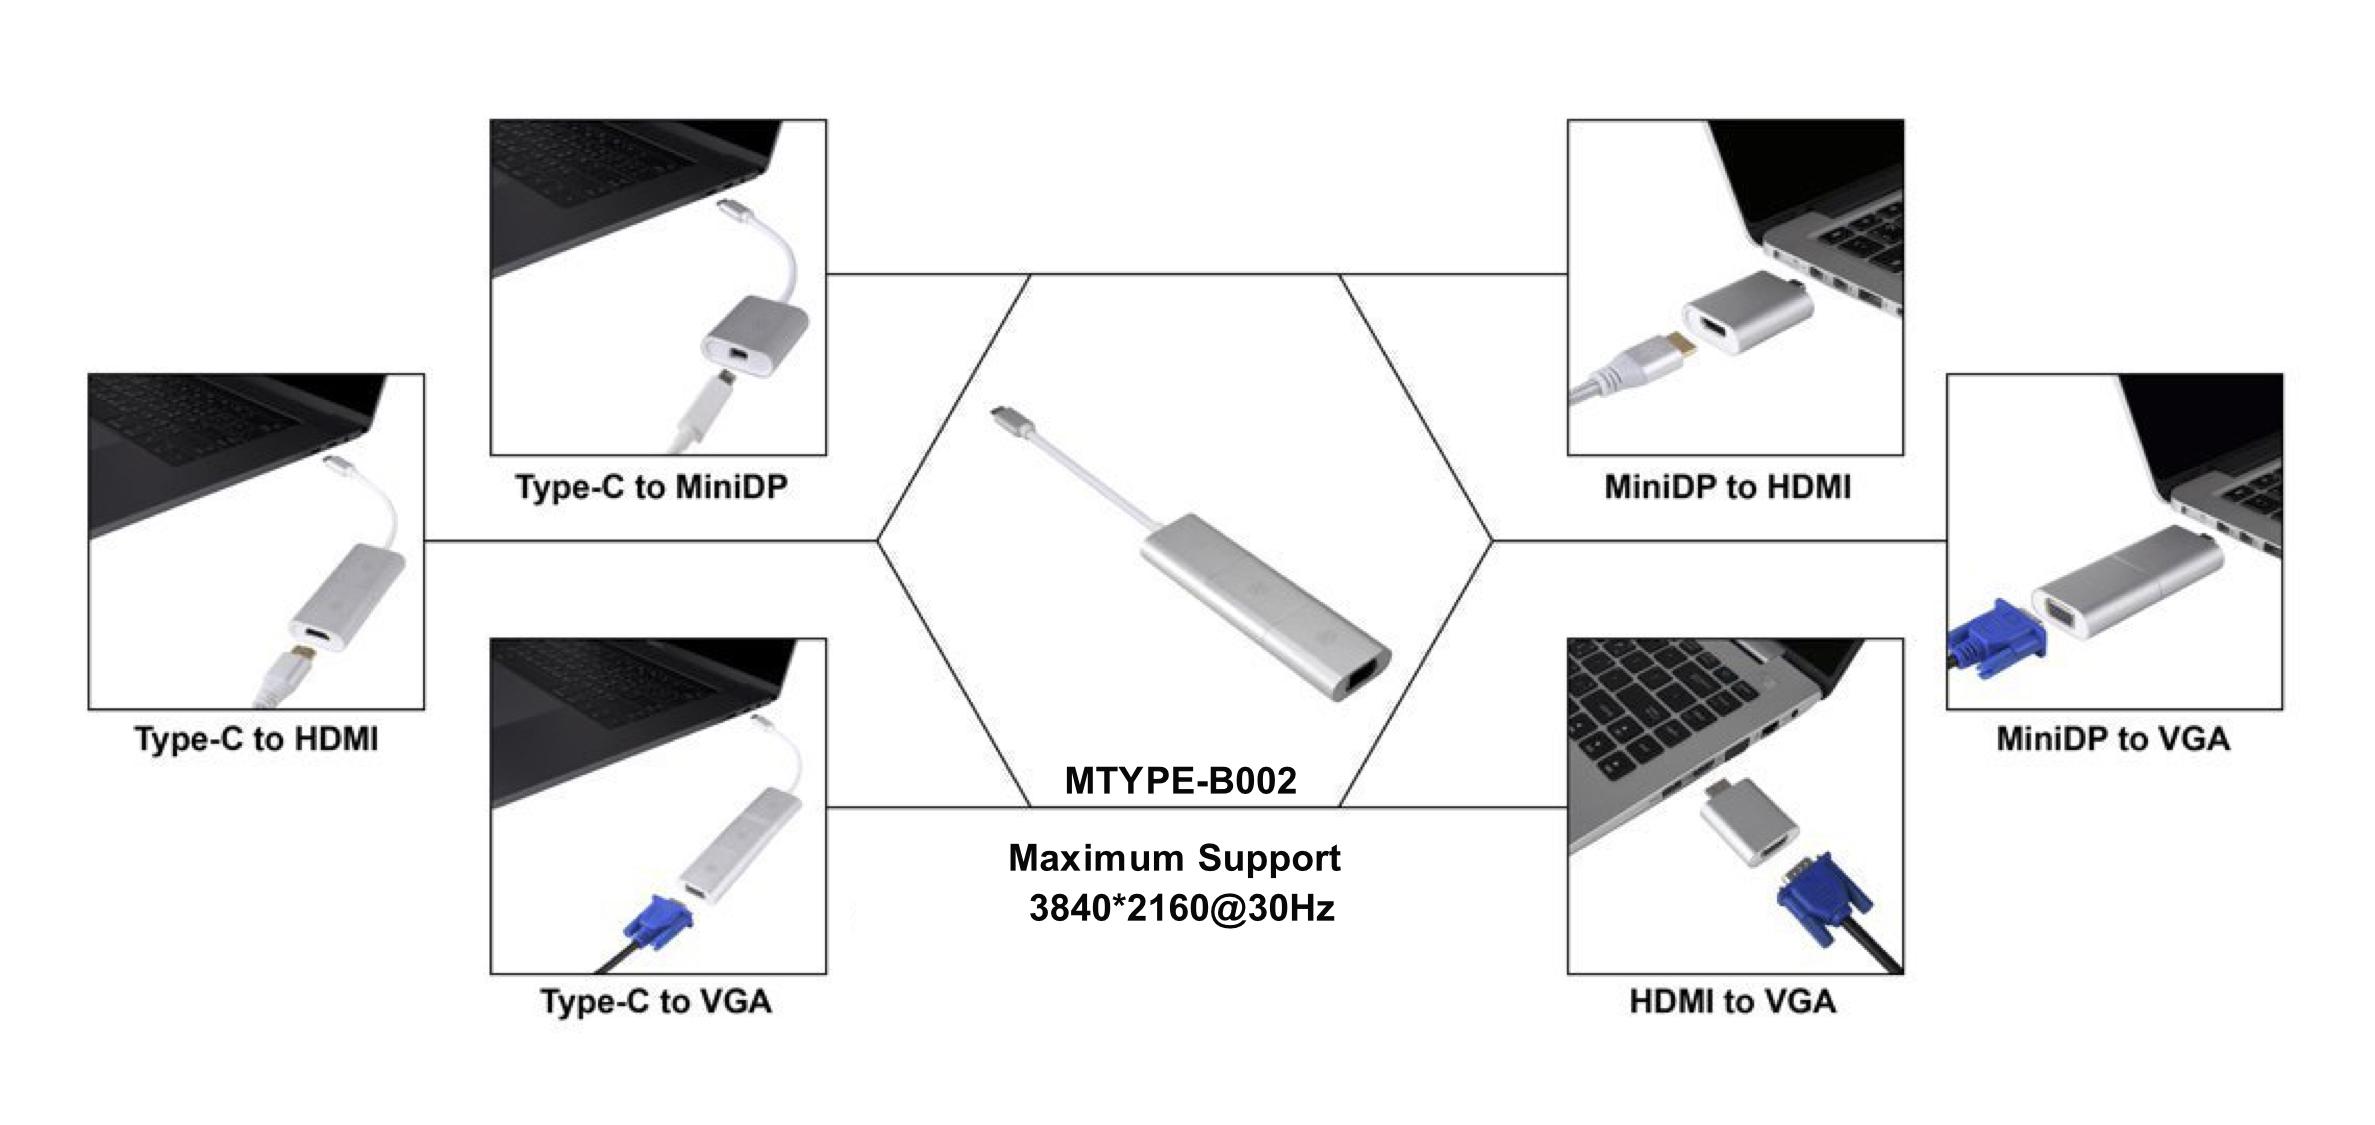 Macbook Pro Mini Displayport To Hdmi Wiring Diagram Wiring Diagram